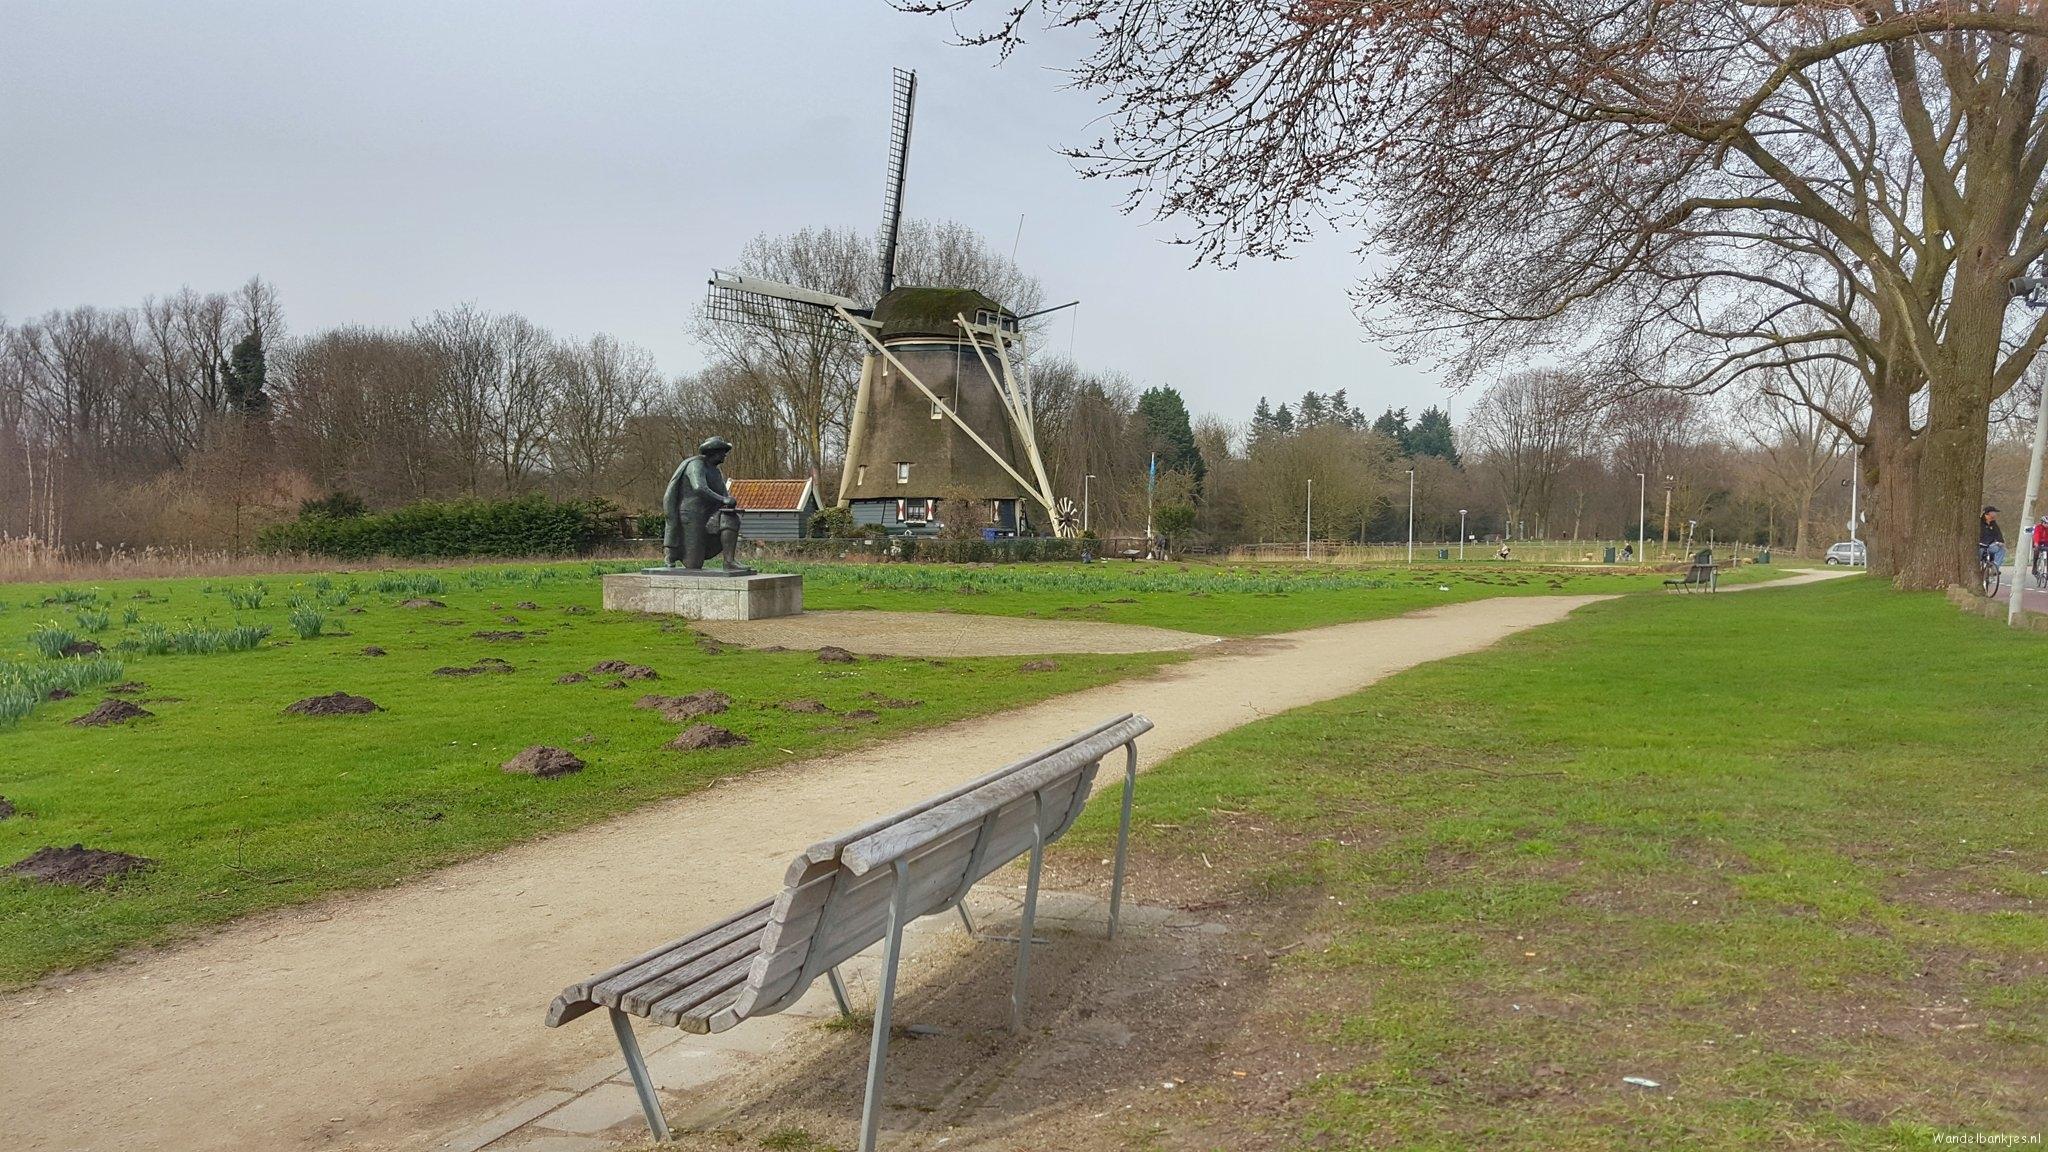 rt-tragetochten-riekermolen-bij-het-amstelpark-wandelbankjes-httpst-cox4askunfzu-httpst-cohjplqh2mj1